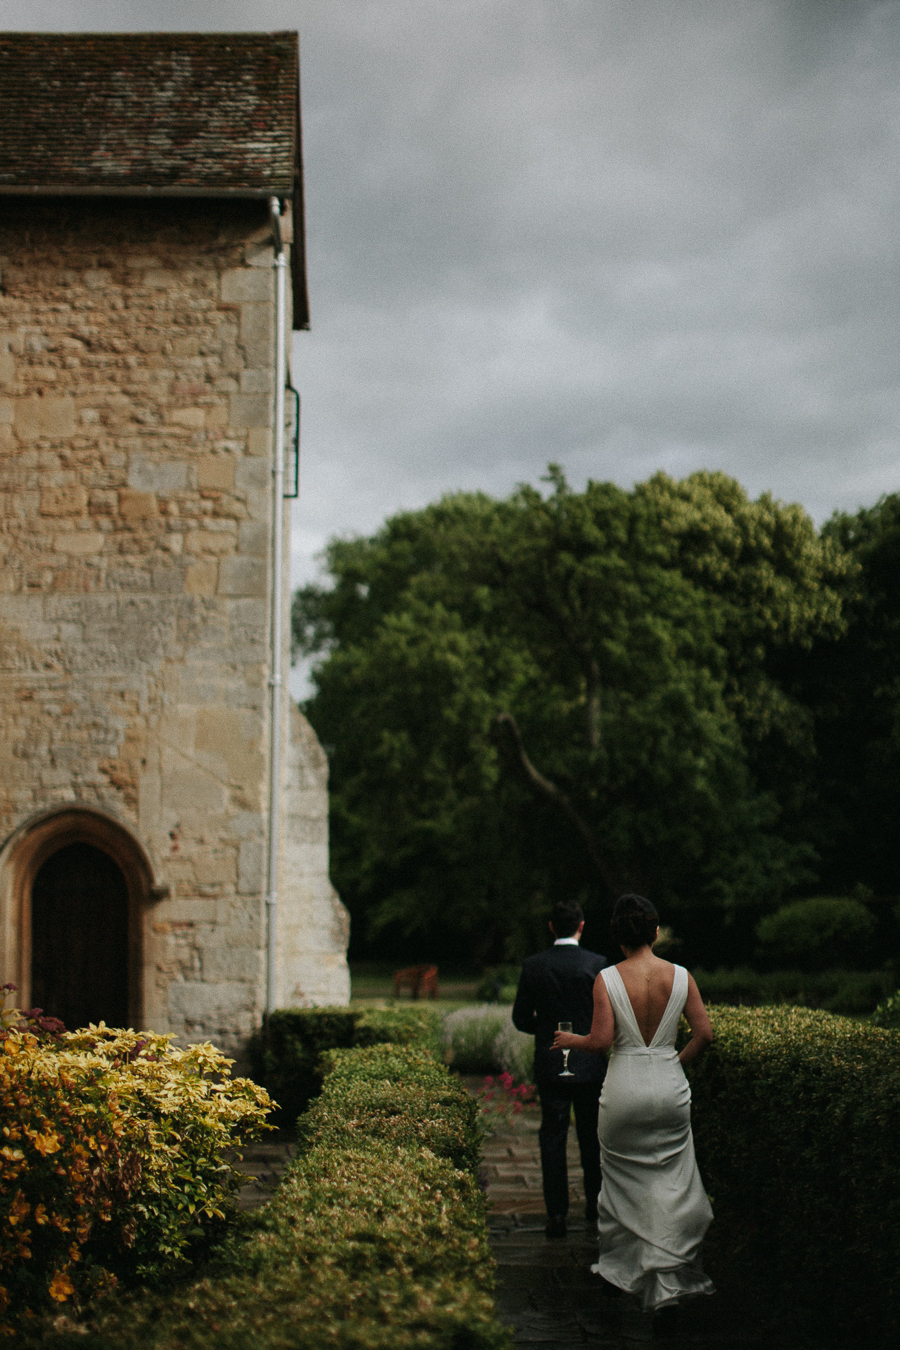 Notley-abbey-buckinghamshire-england-wedding-abi-q-photography--180.jpg